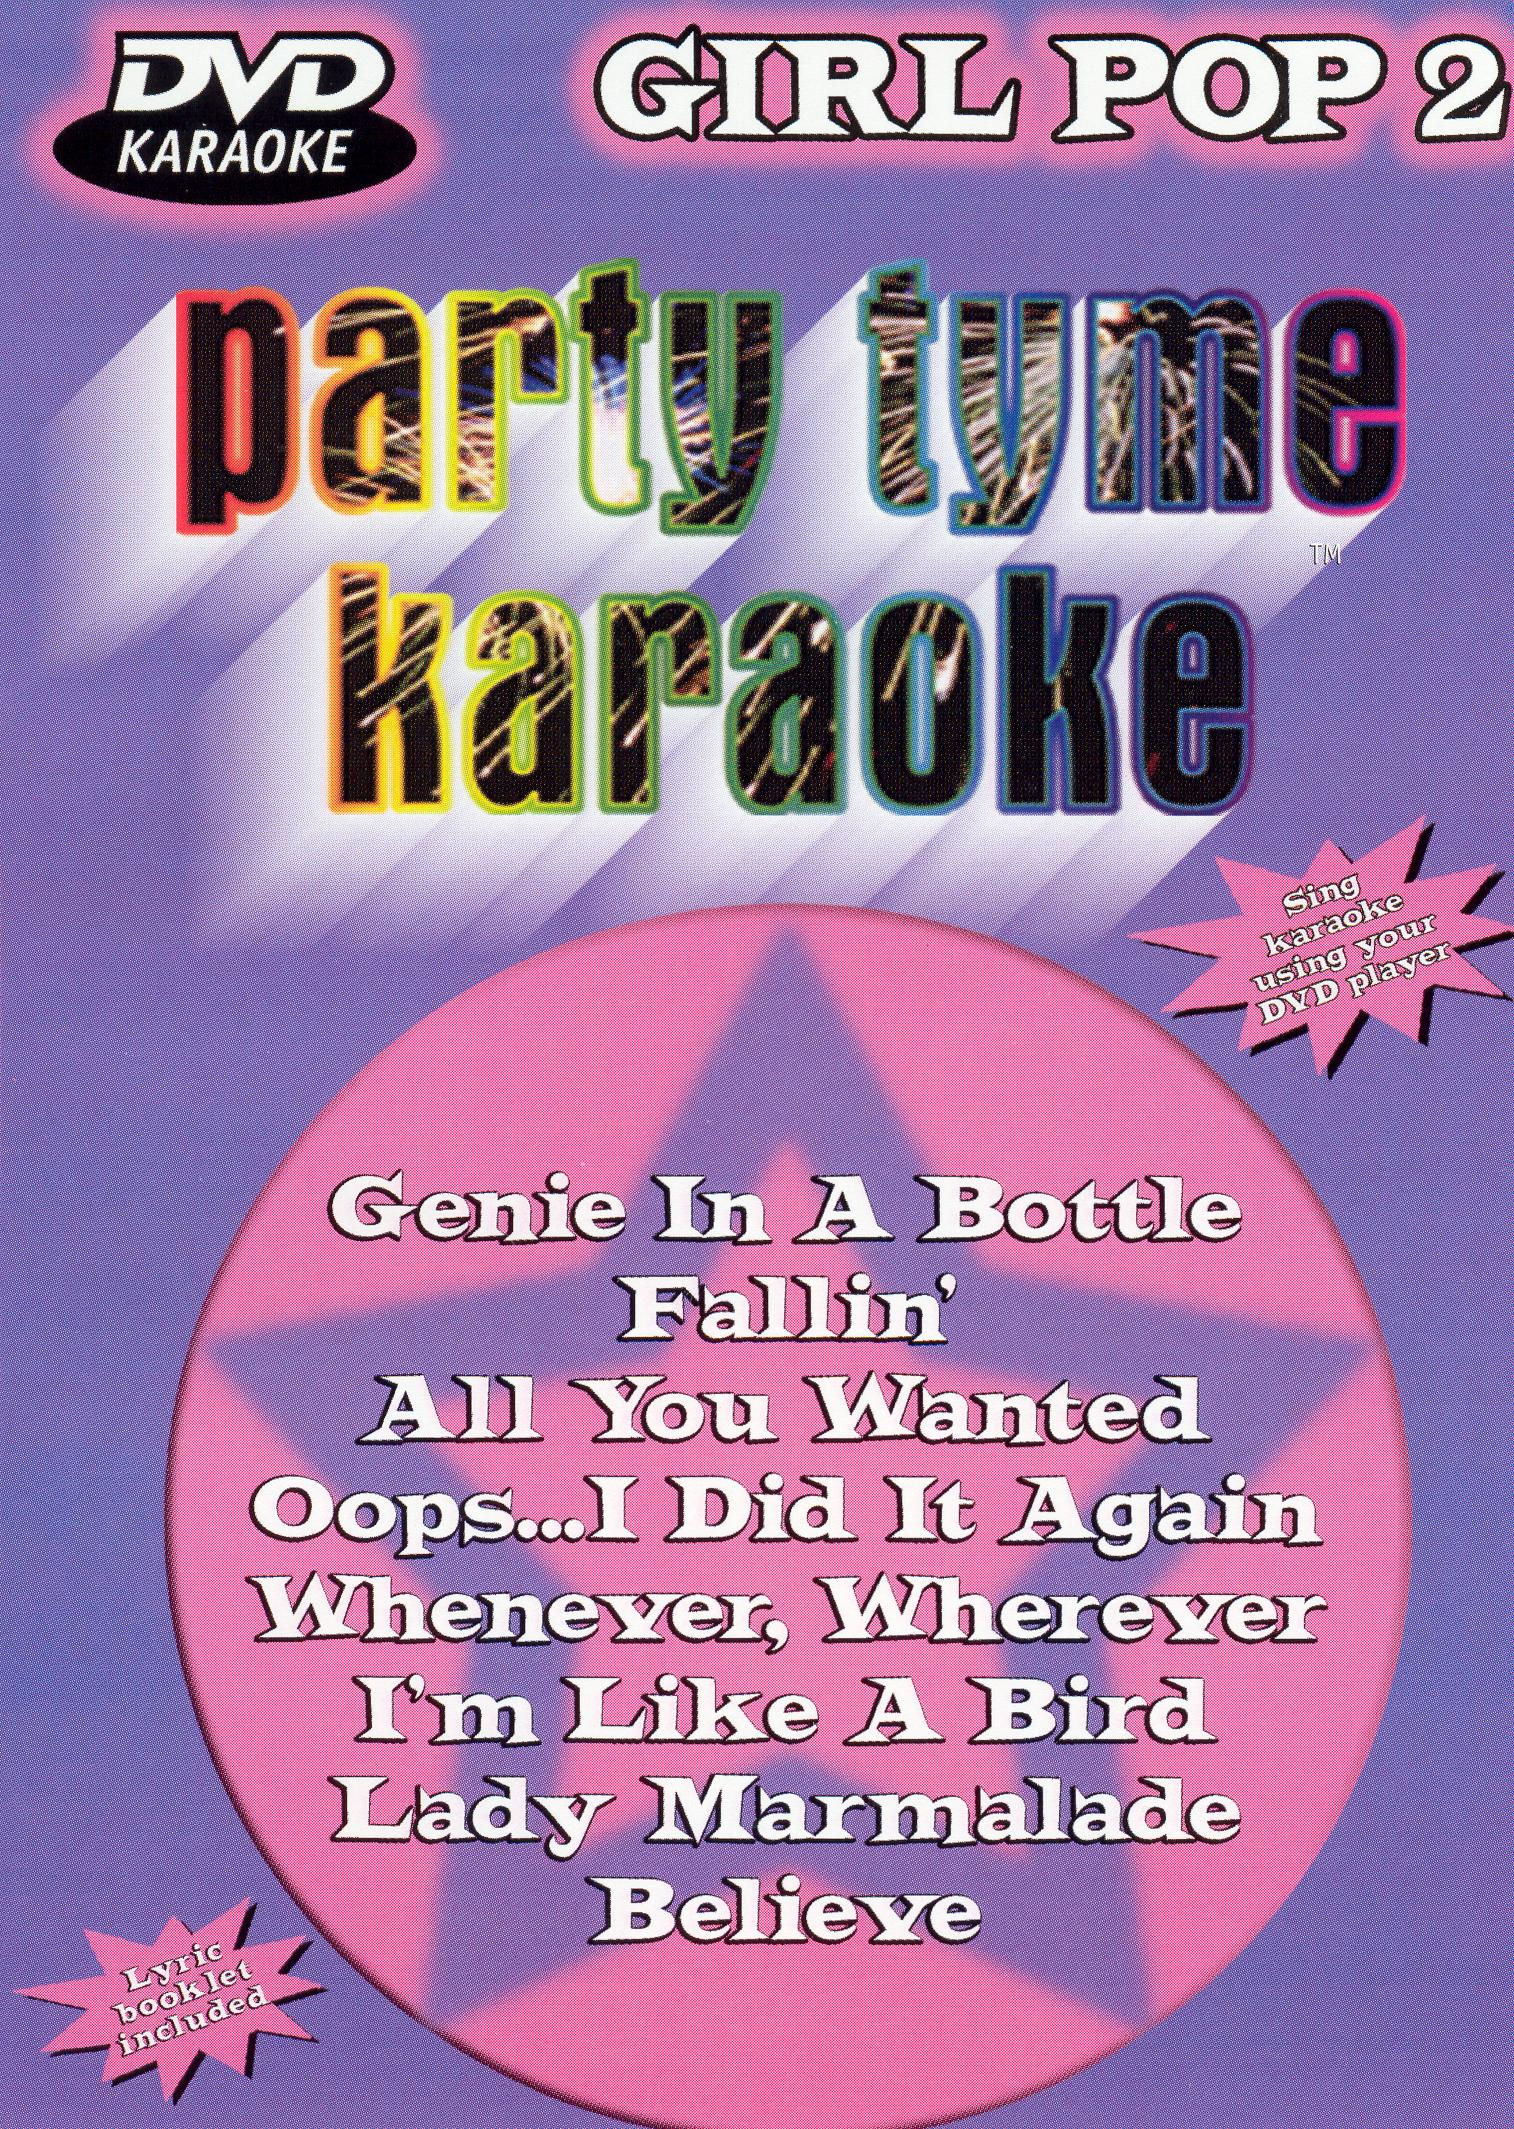 Party Tyme Karaoke: Girl Pop, Vol. 2